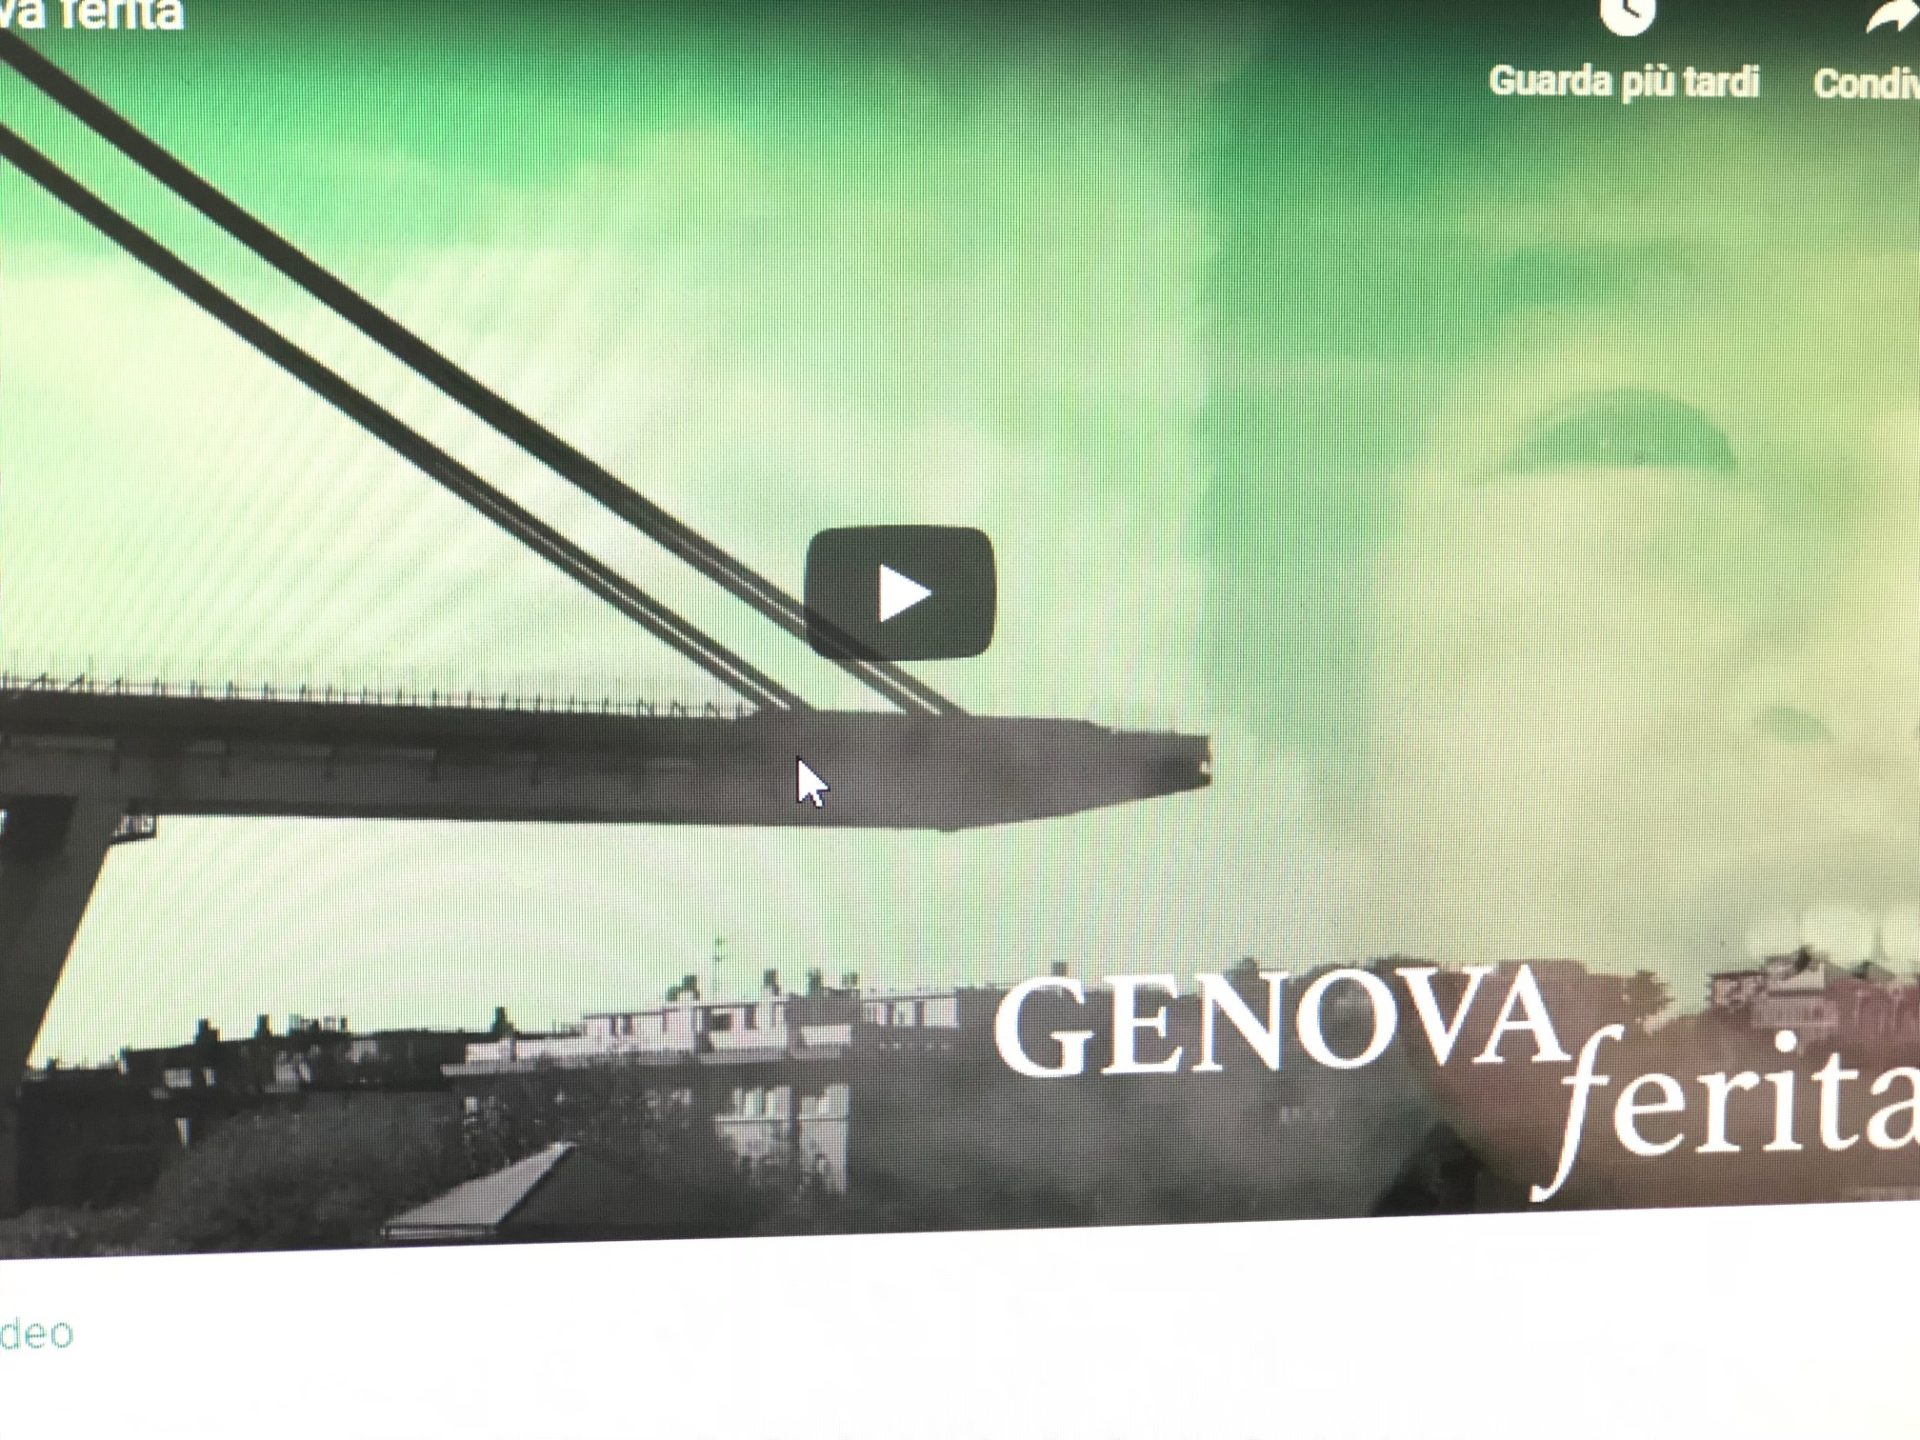 Genova ferita.jpeg